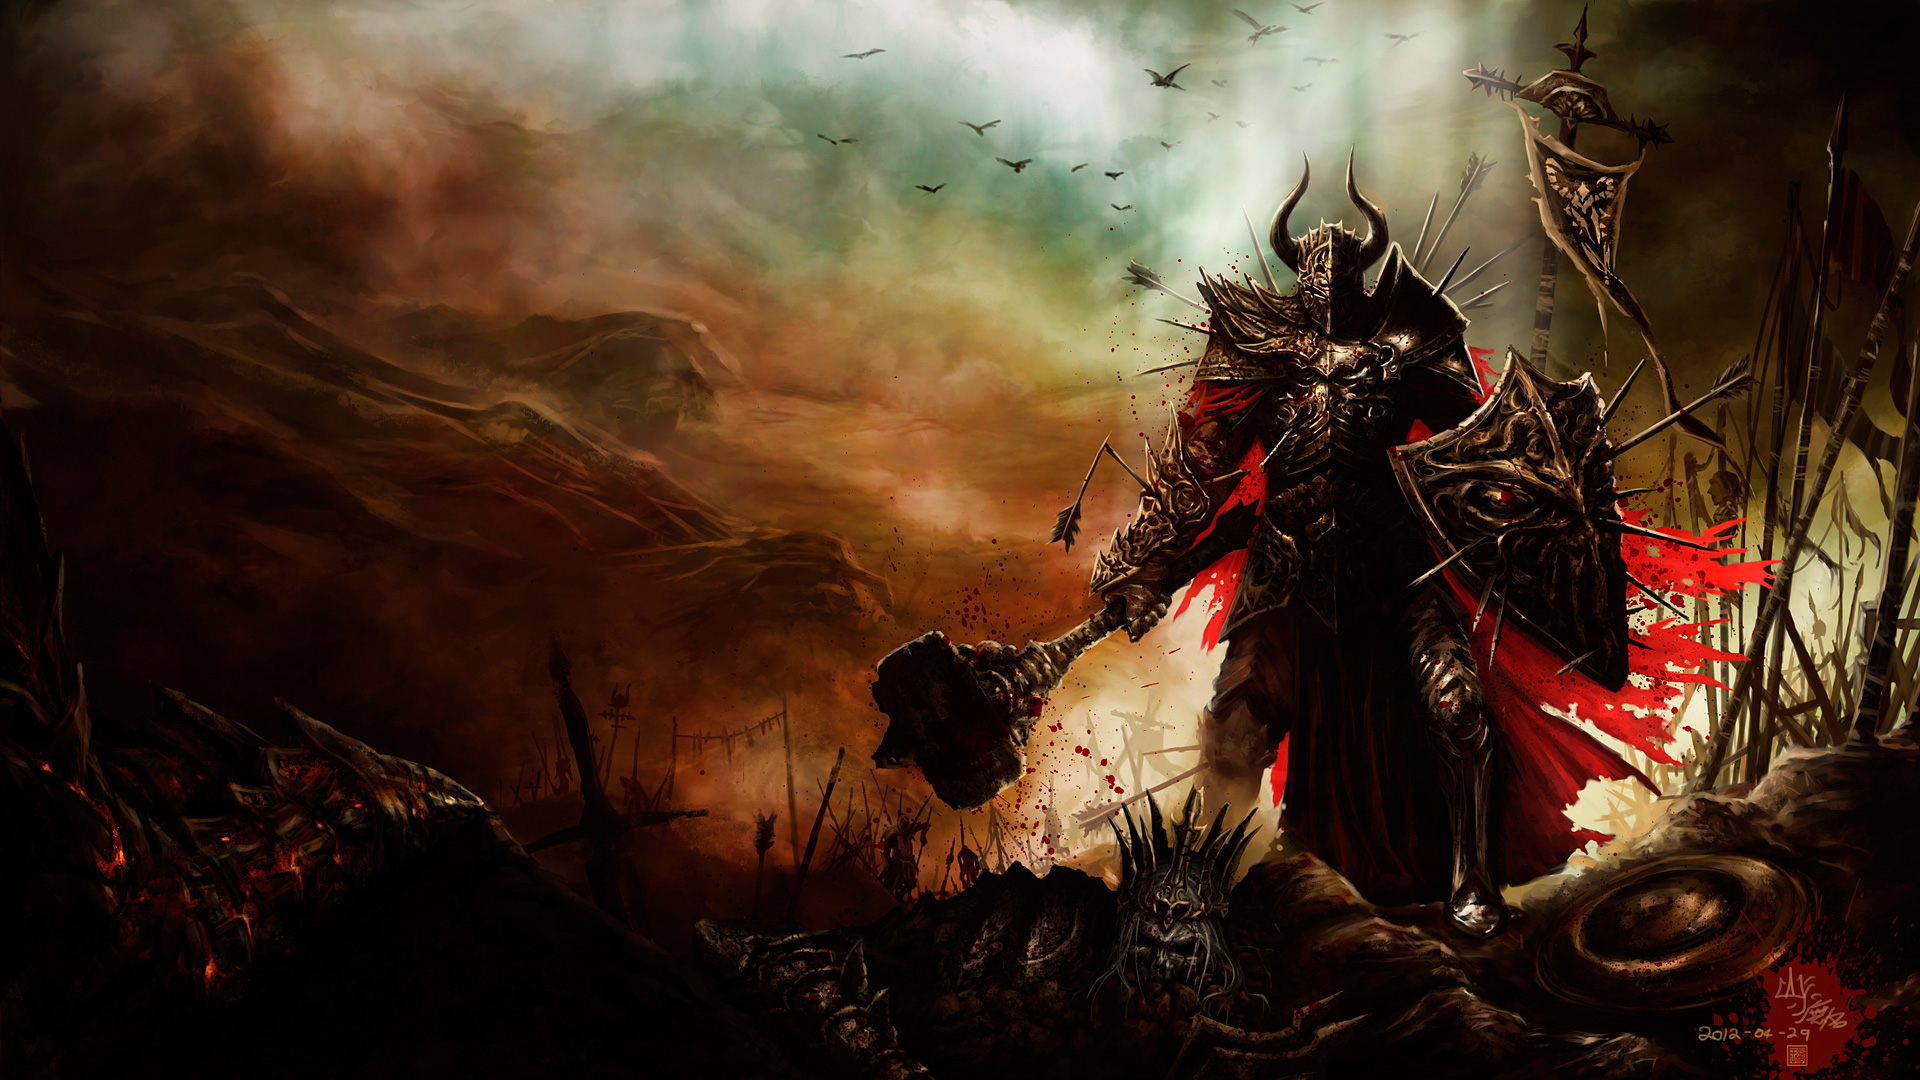 Descargar Dibujo Diablo III HD videojuegos rojo oscuro marron fantasia 1920x1080